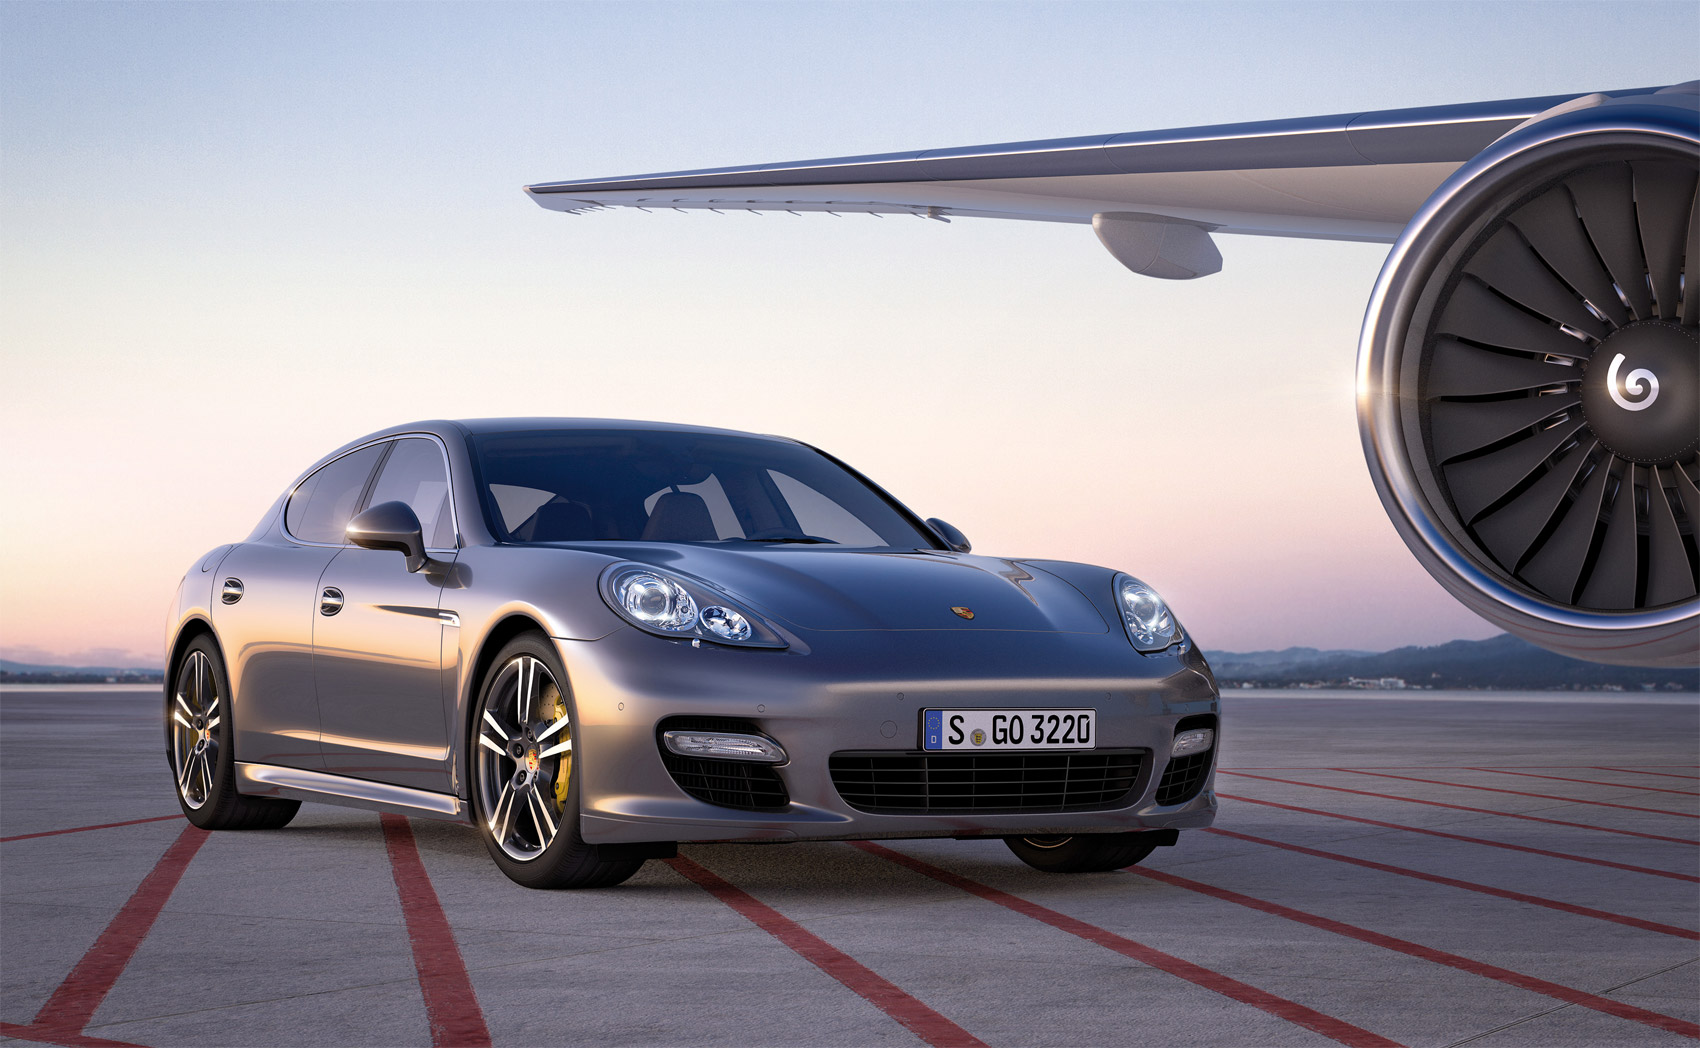 Porsche Cars North America sold 731 Panamera's in November